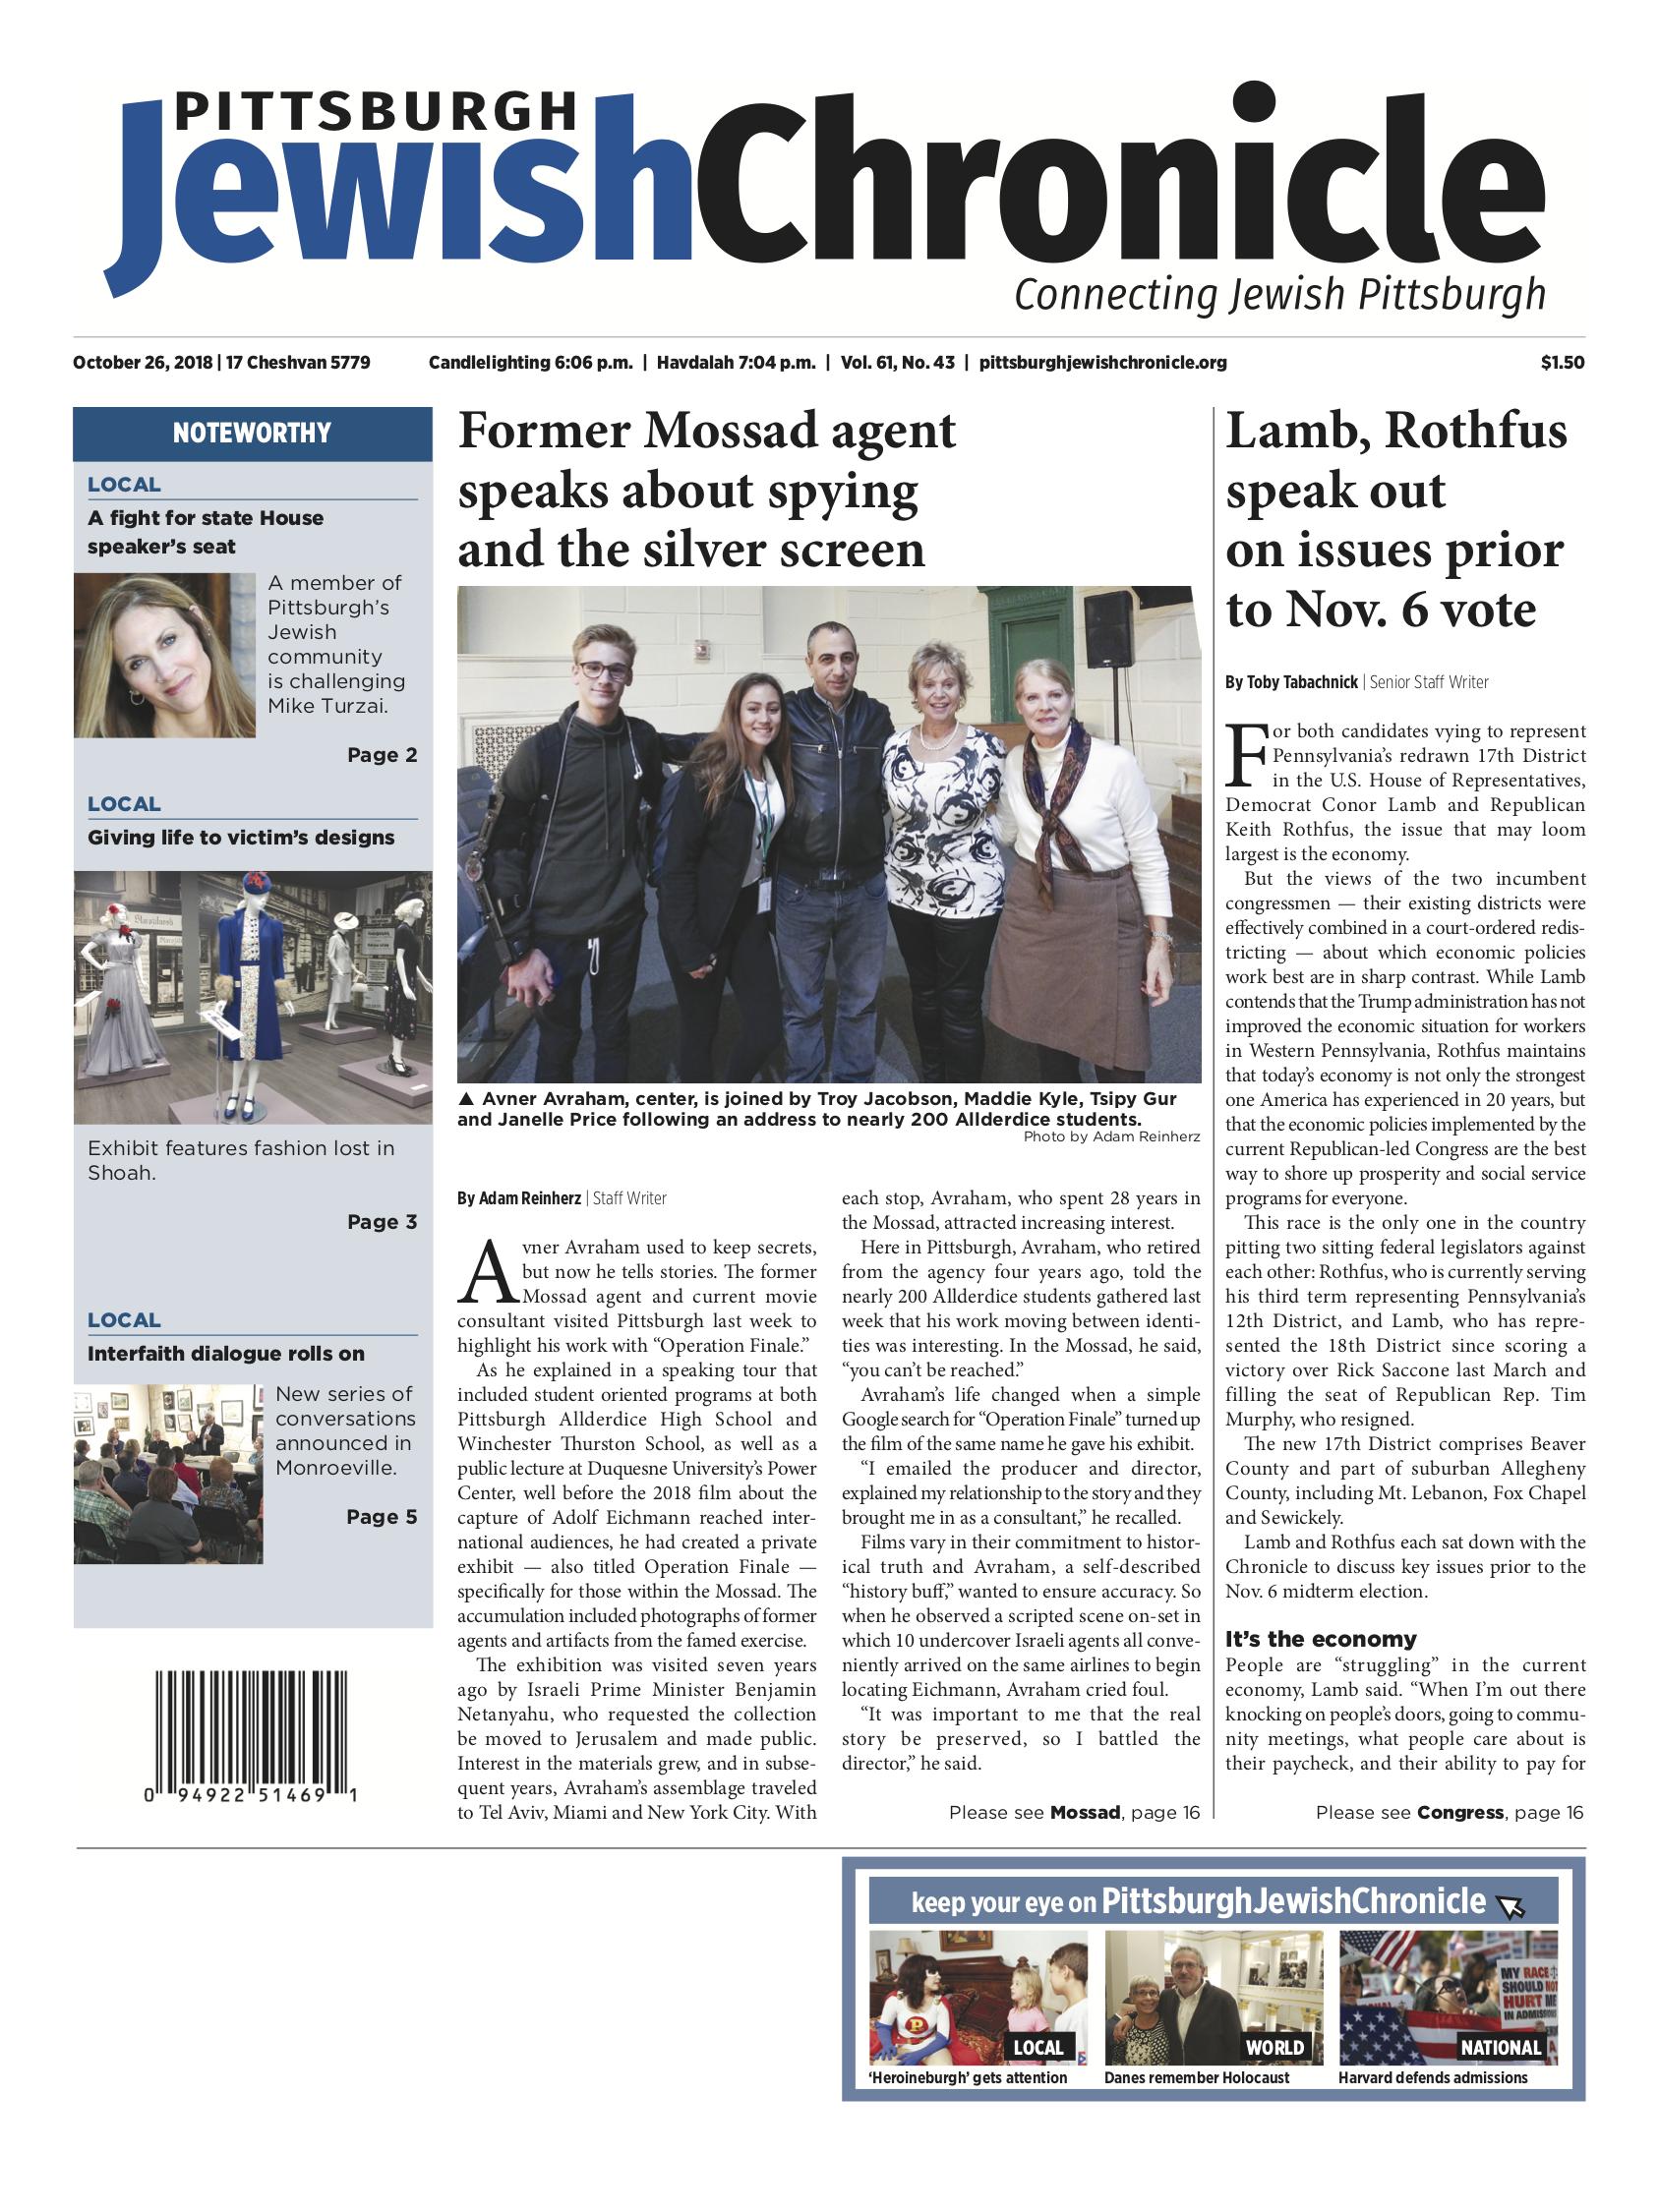 Pittsburgh Jewish Chronicle 10/26/2018